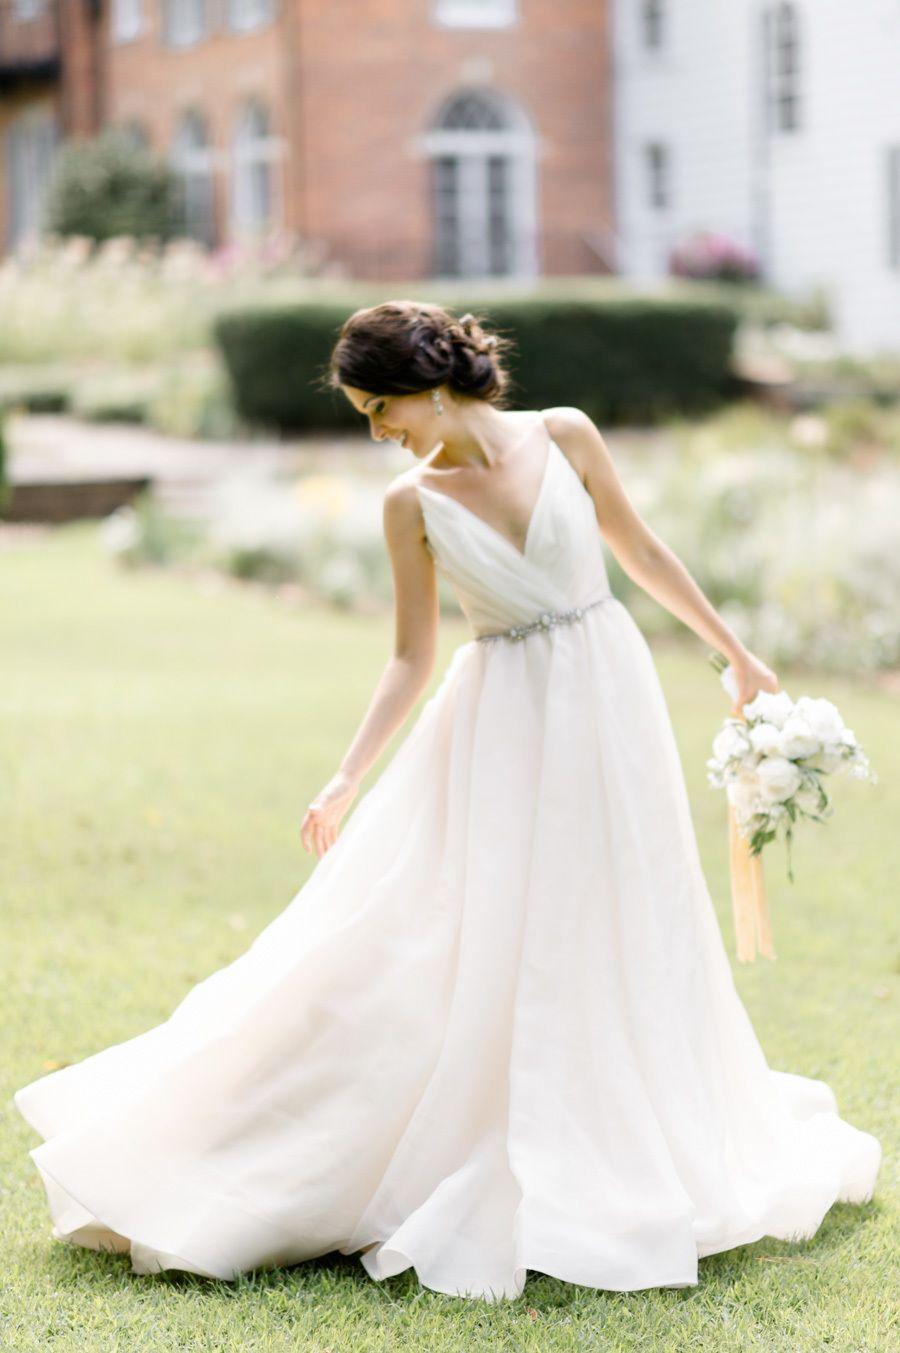 Modern elegance wedding inspiration shoot hayley paige lima and